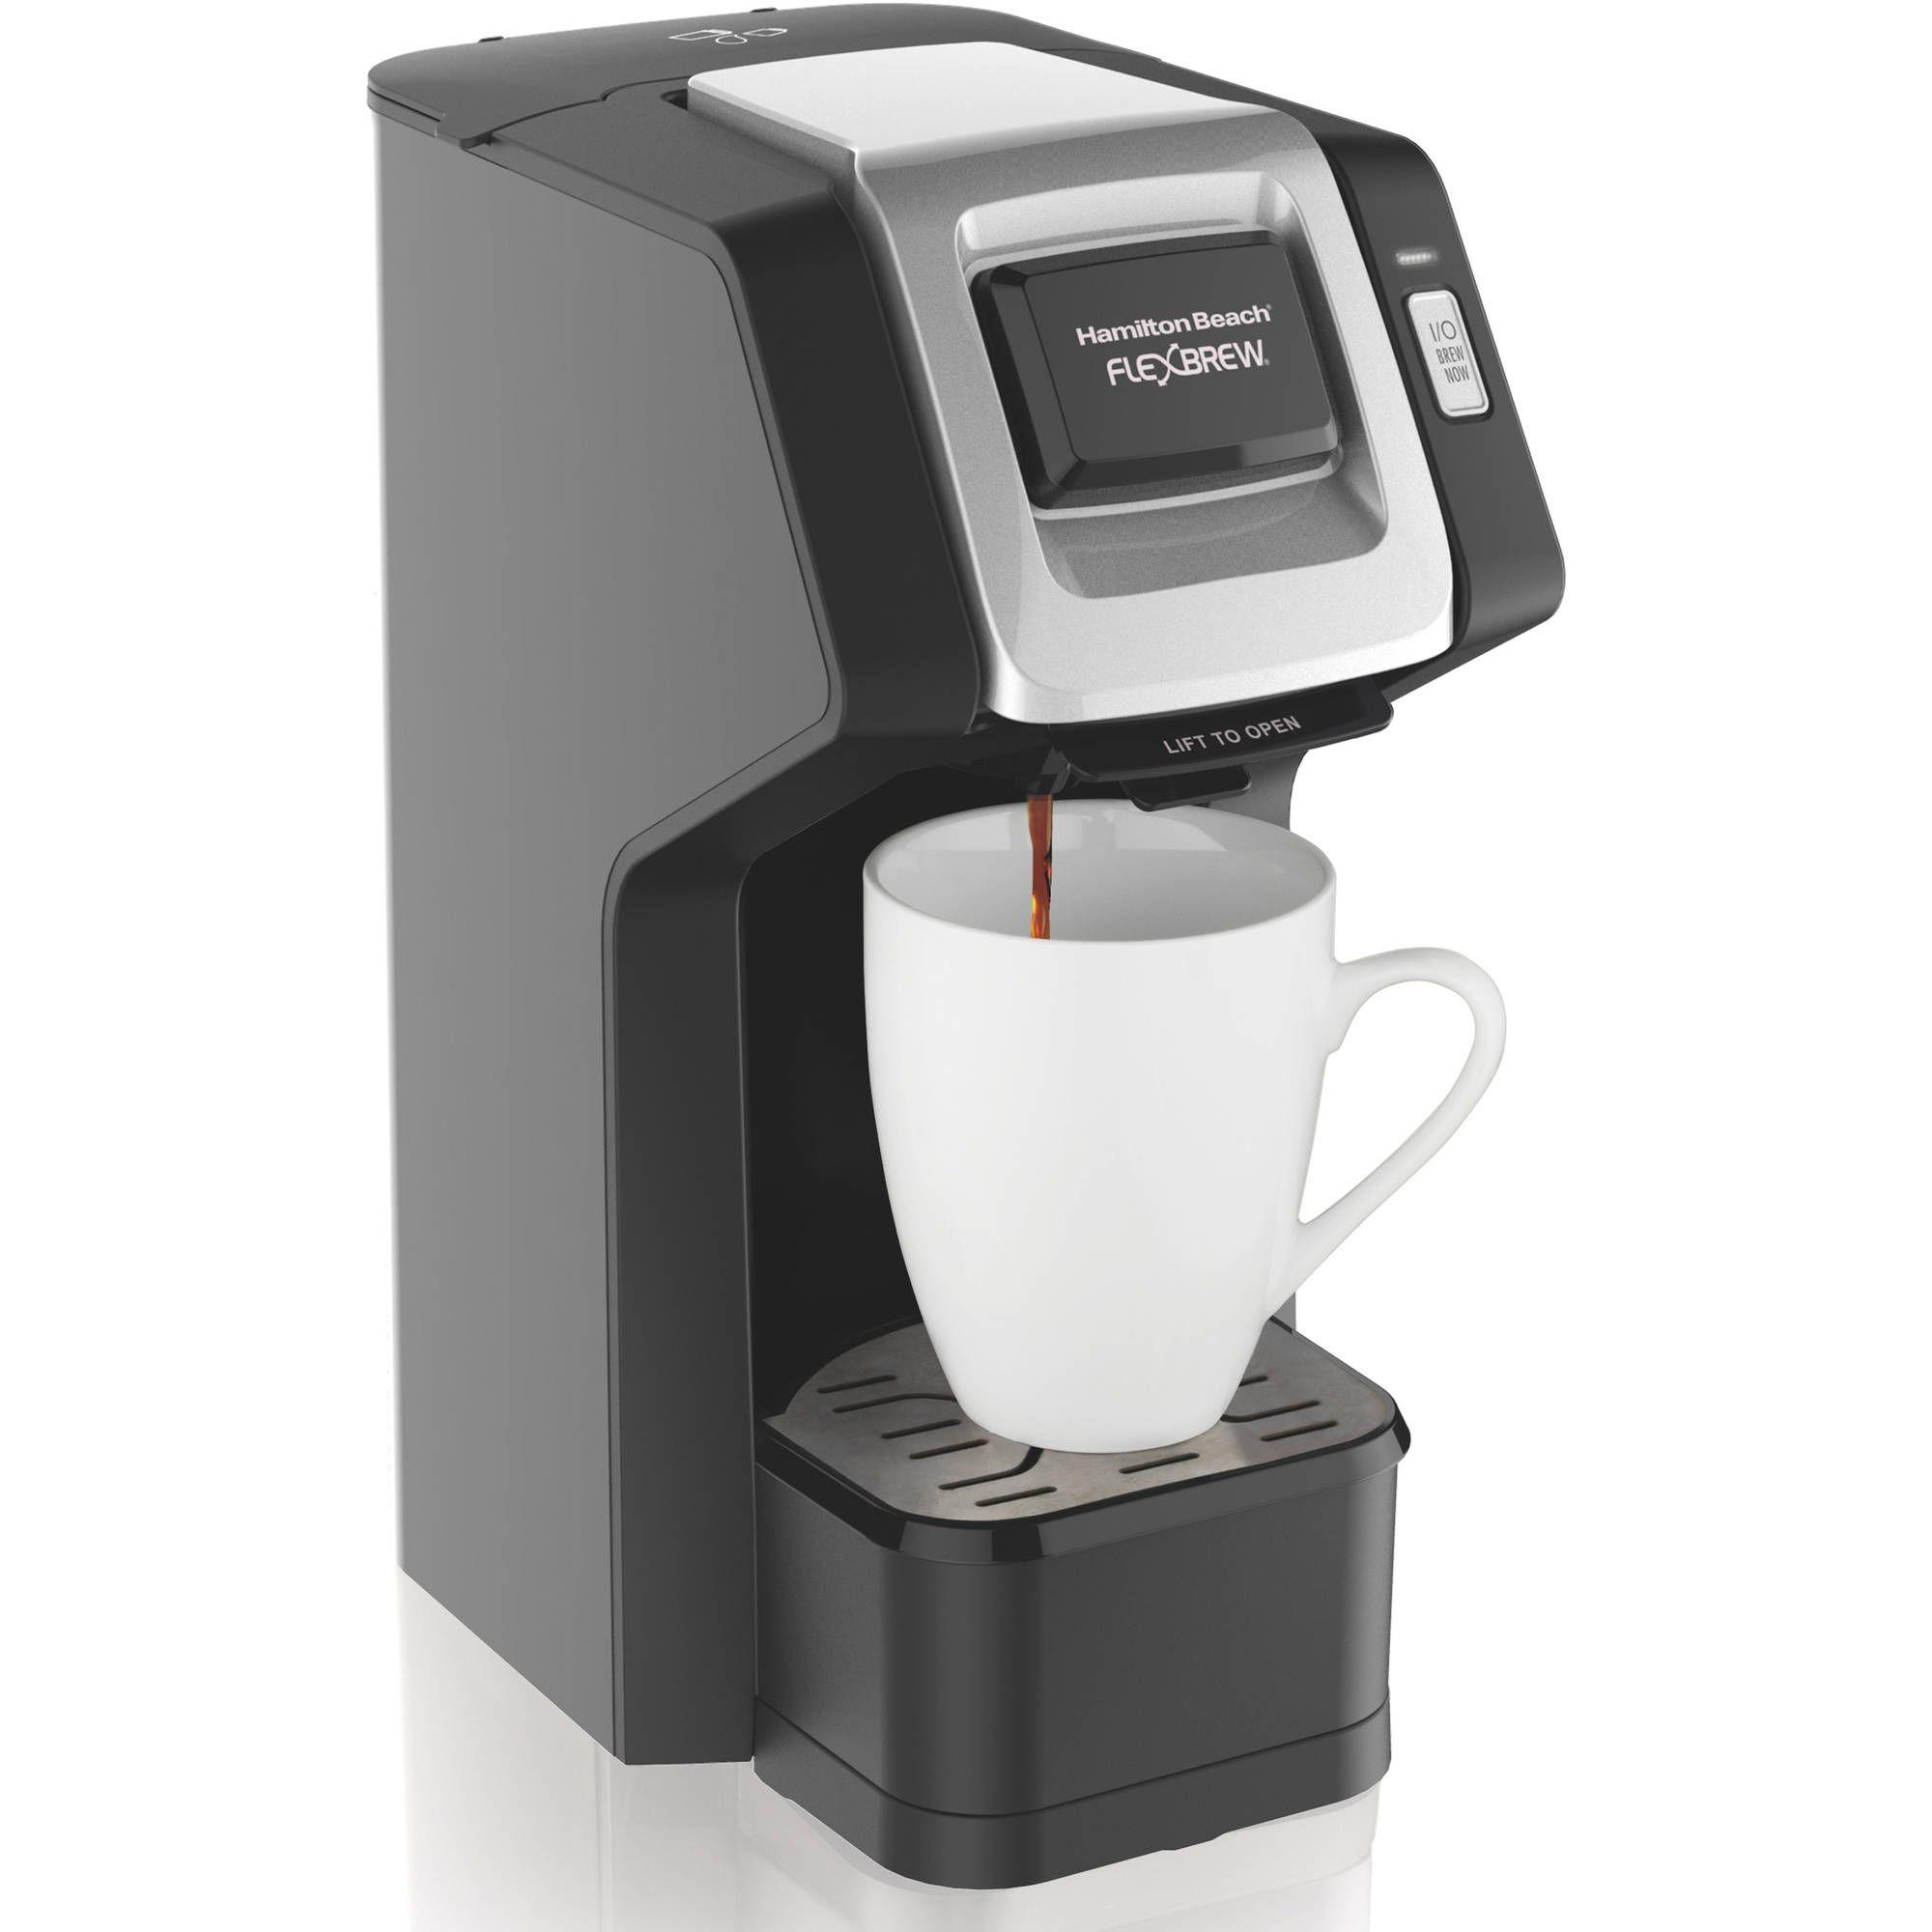 Home Single serve coffee, Coffee brewer, Coffee maker